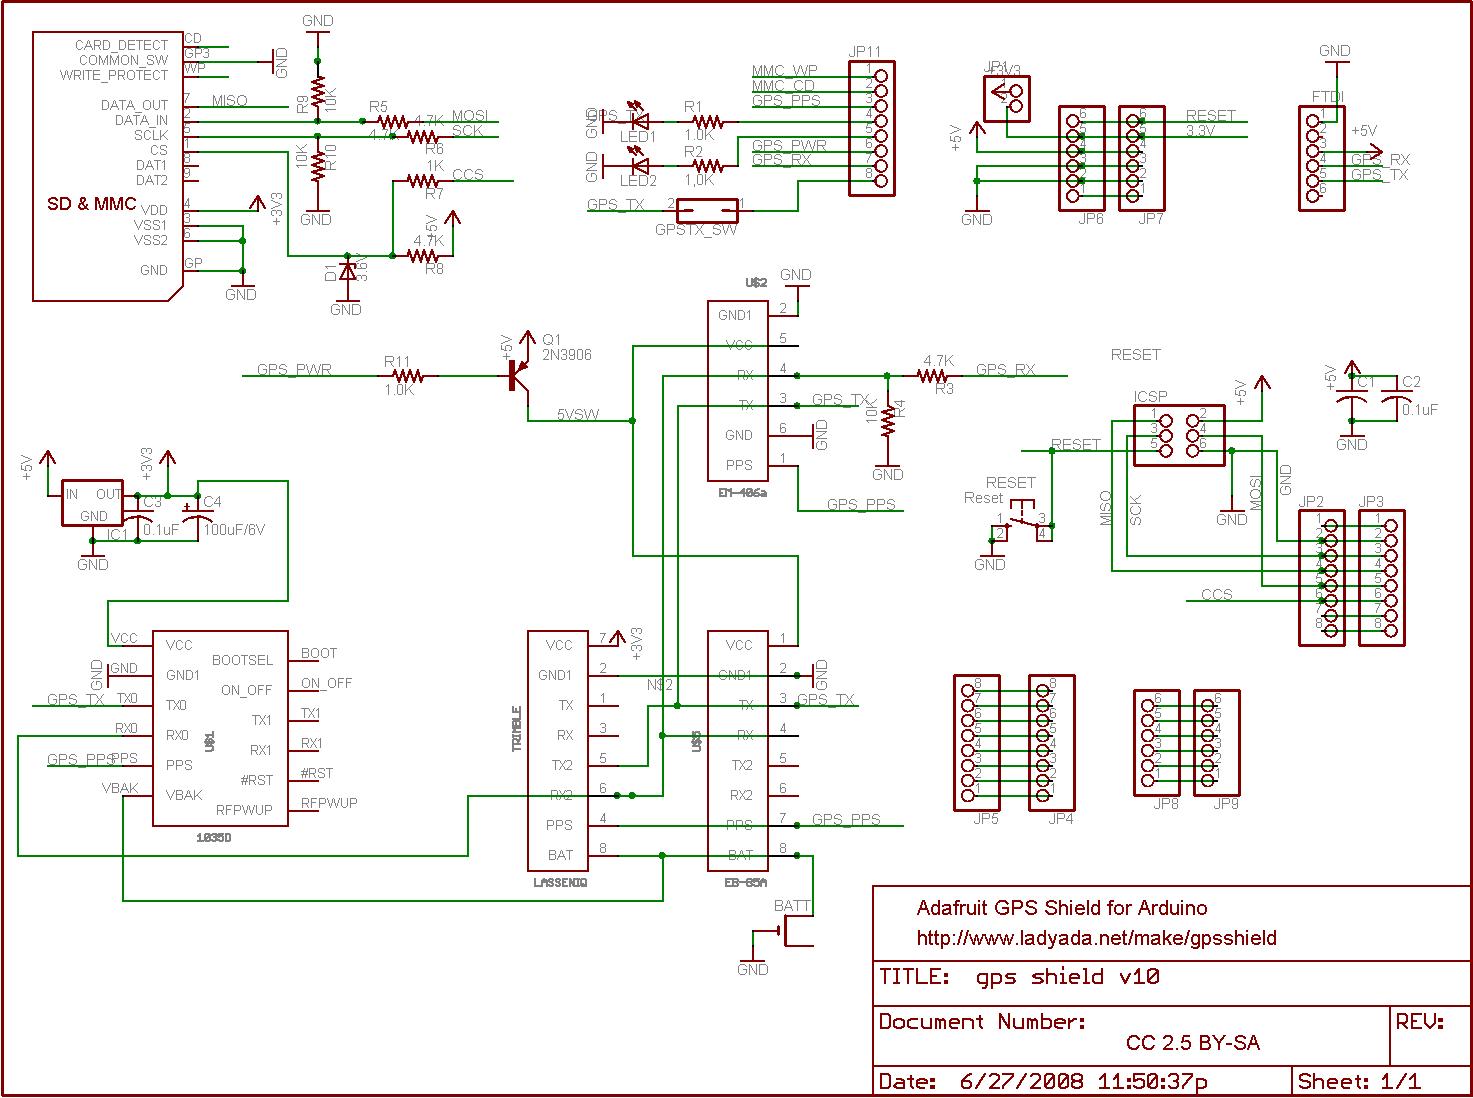 GPS datalogging shield for Arduino - schematic